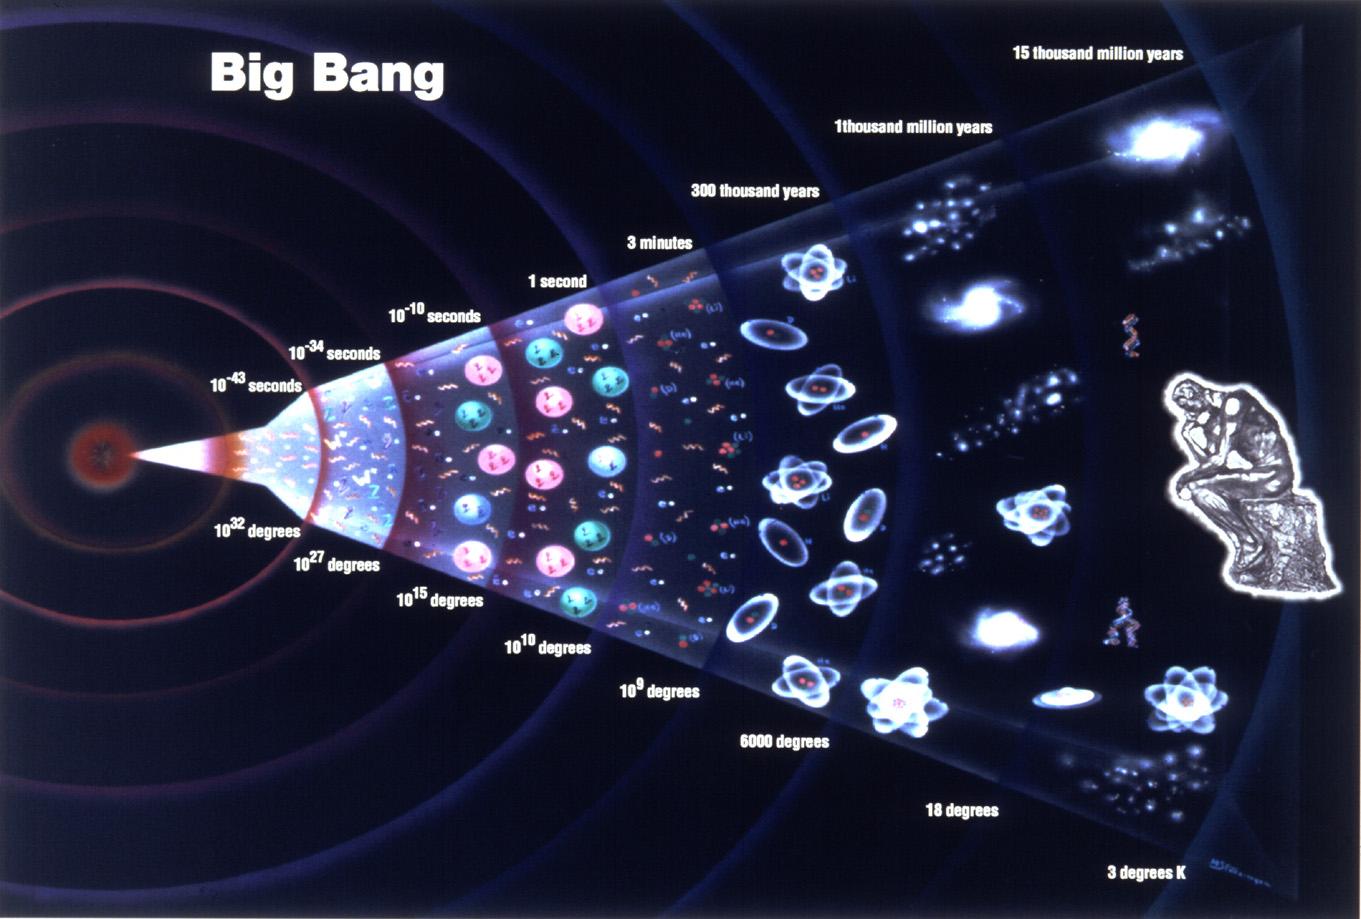 Big Bang incontri